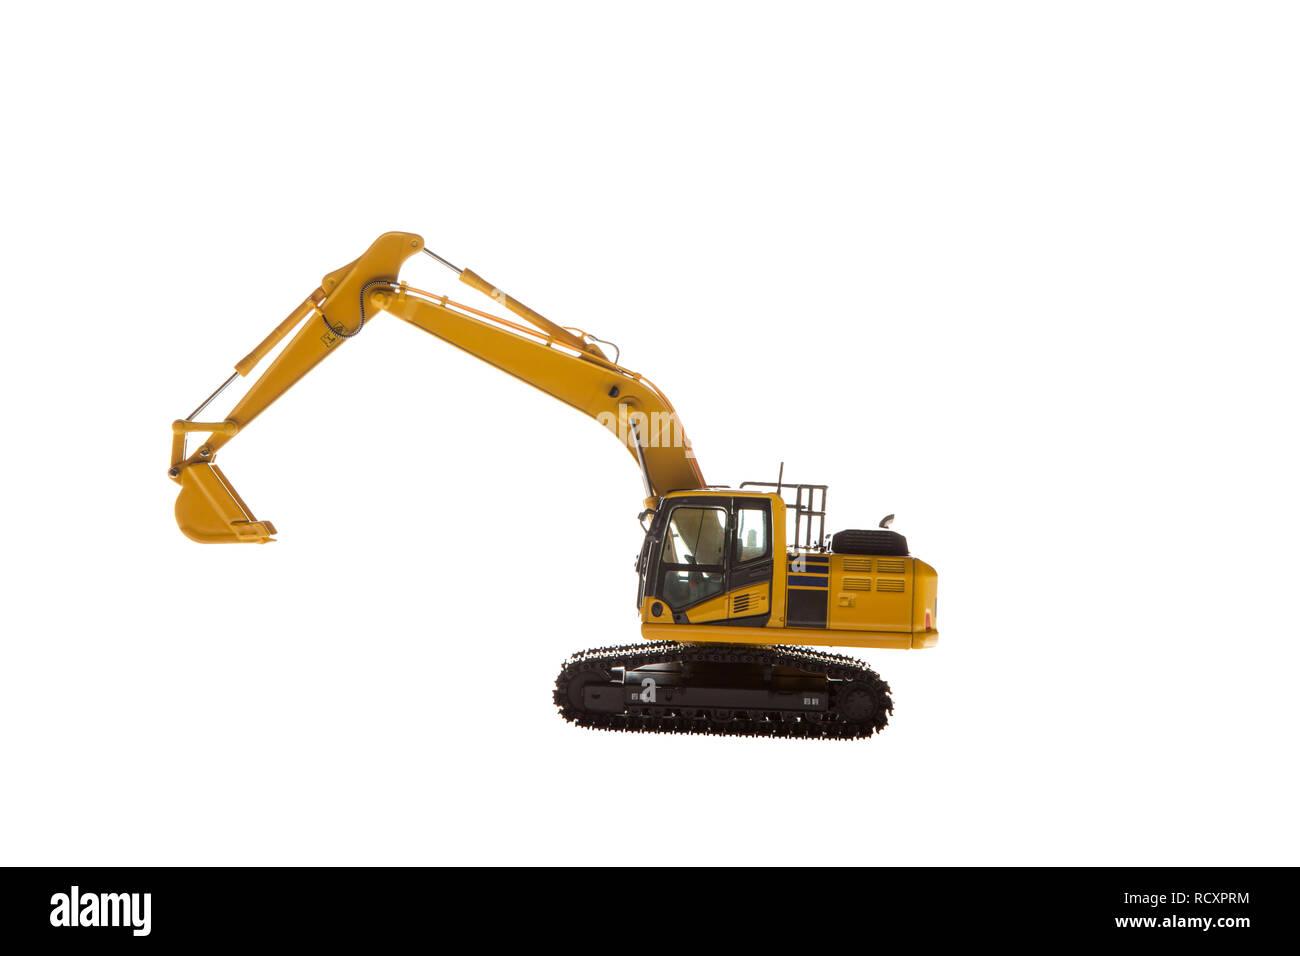 Heavy construction machinery isolated on white background - Stock Image